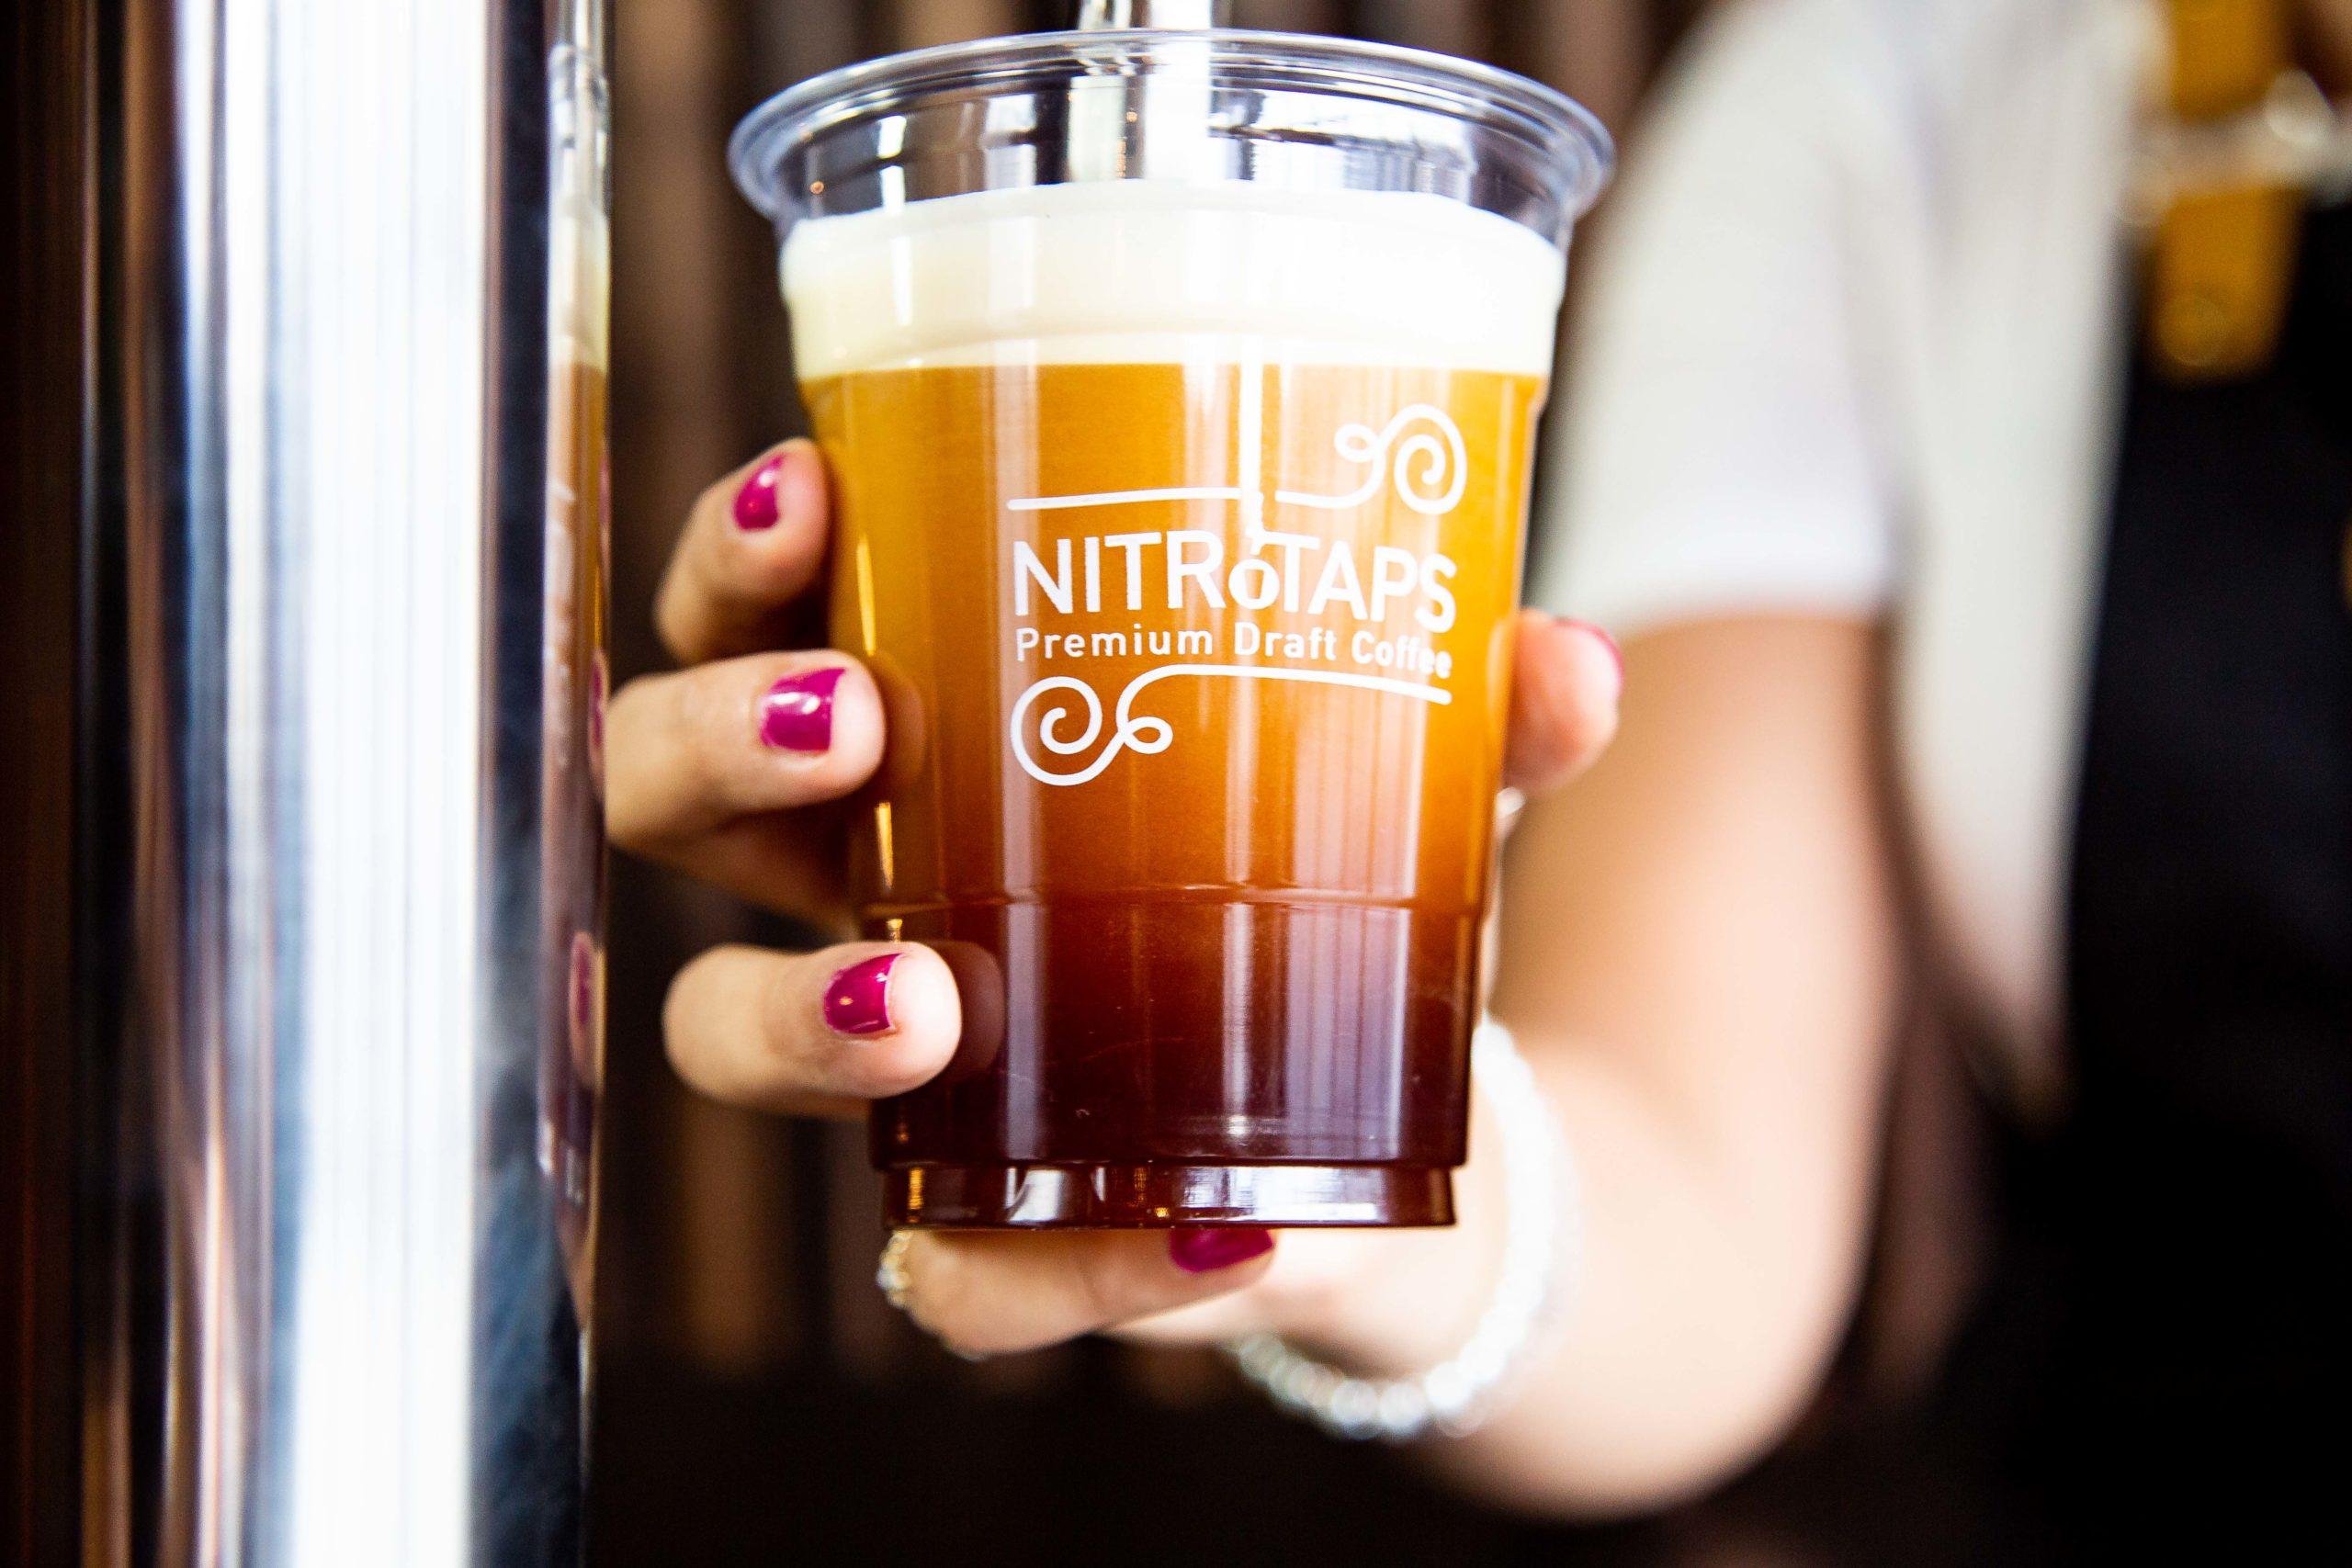 NitroTaps Nitro Coffee Catering NYC